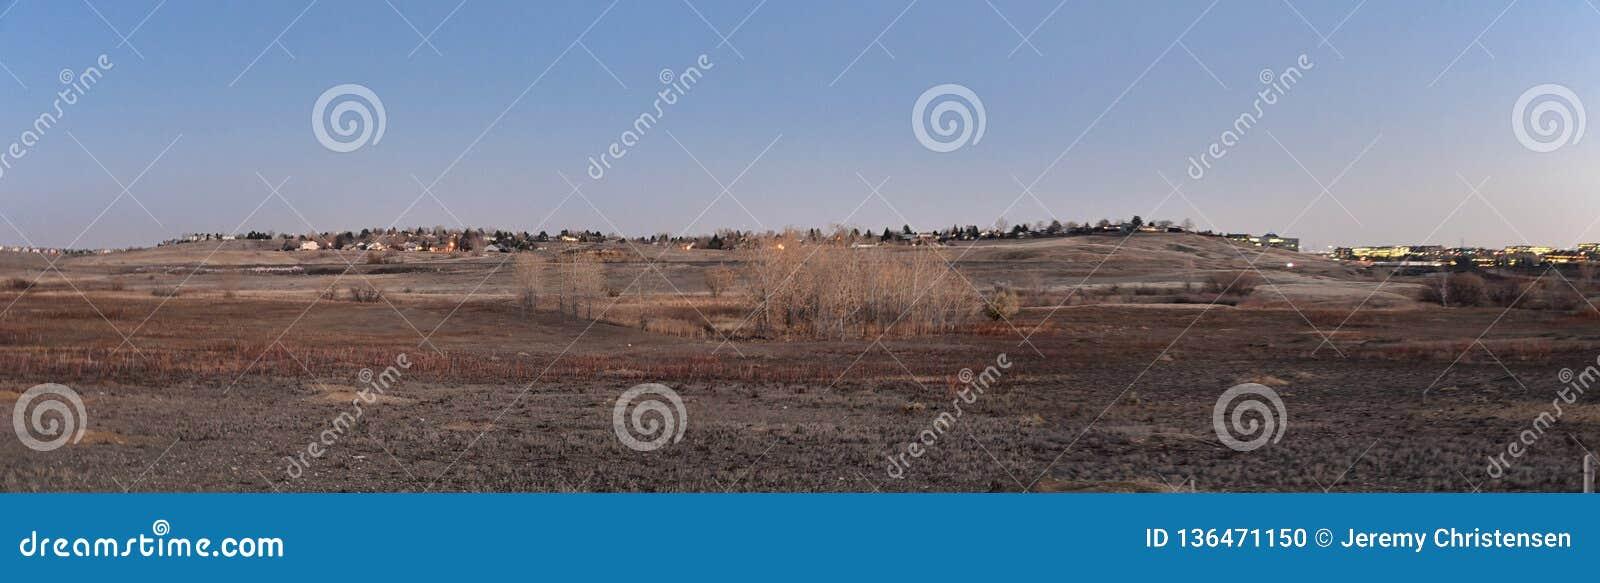 Взгляды с пути следа Cradleboard идя на заповеднике Кэролин Holmberg в Broomfield Колорадо окруженном Cattails, дикими